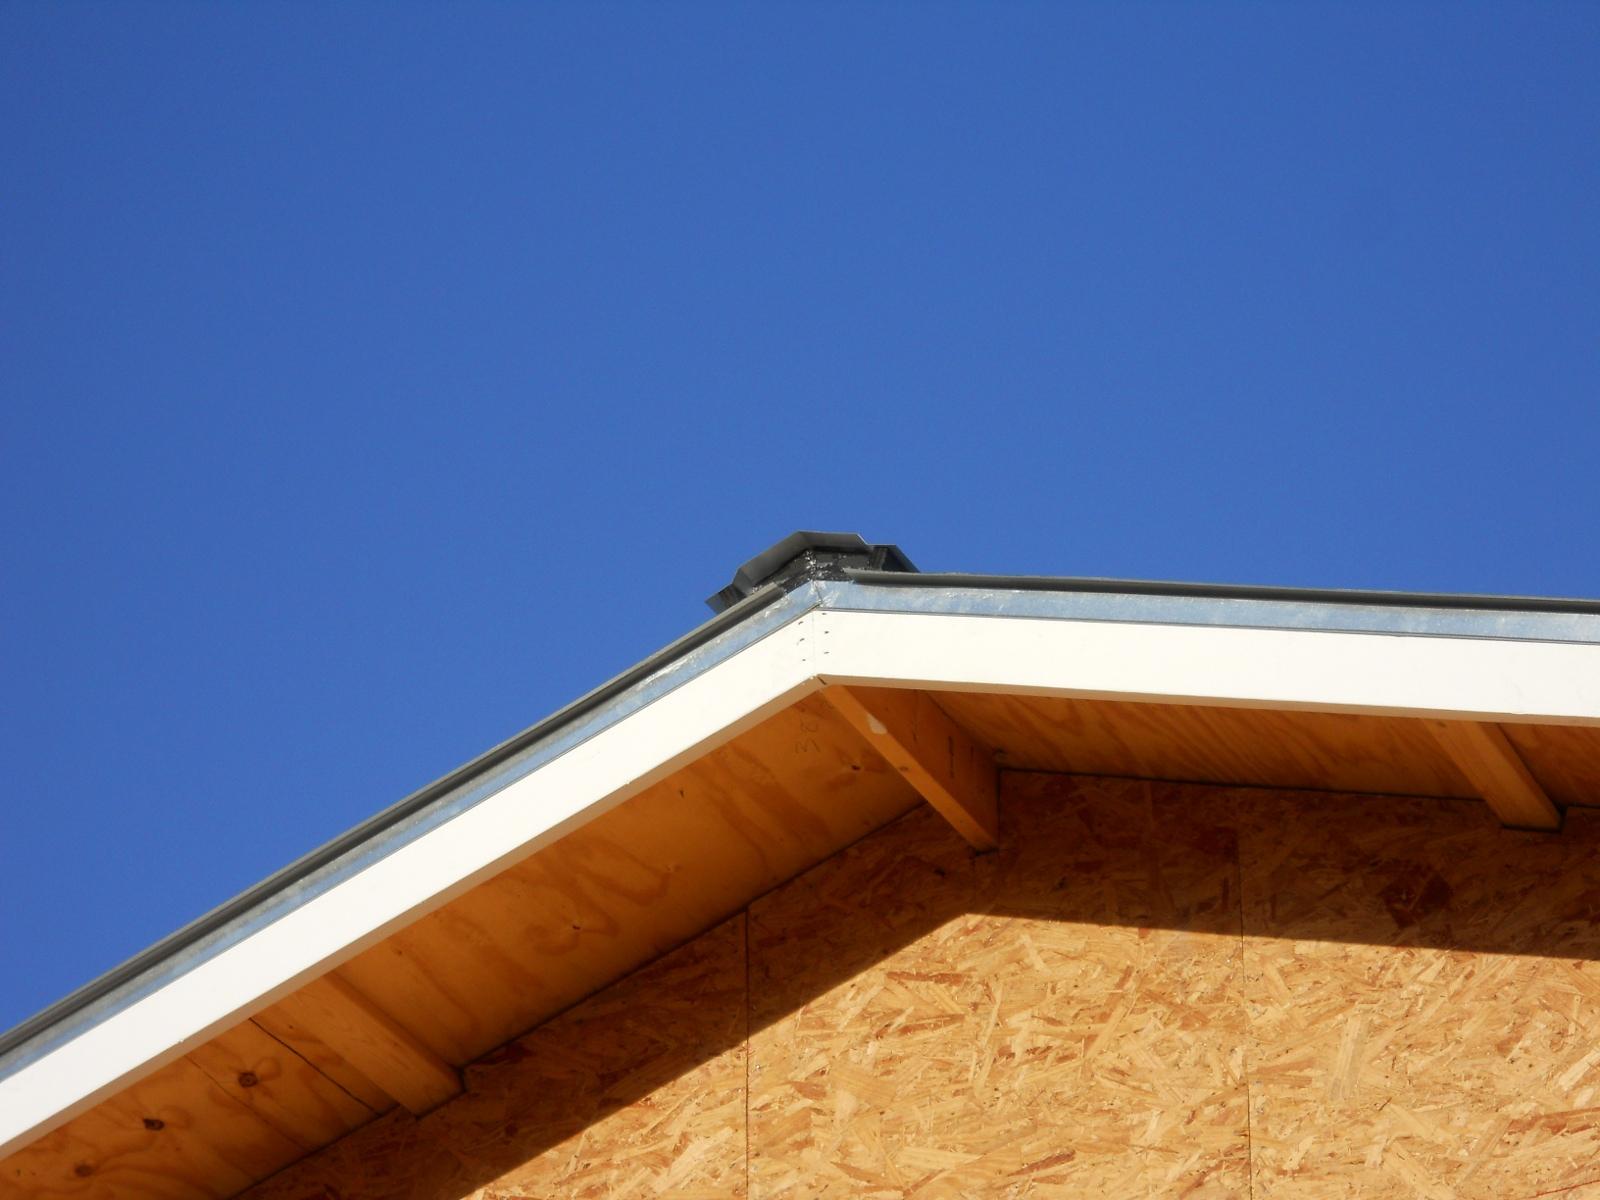 Metal Roofing Ridge Cap For Metal Roof